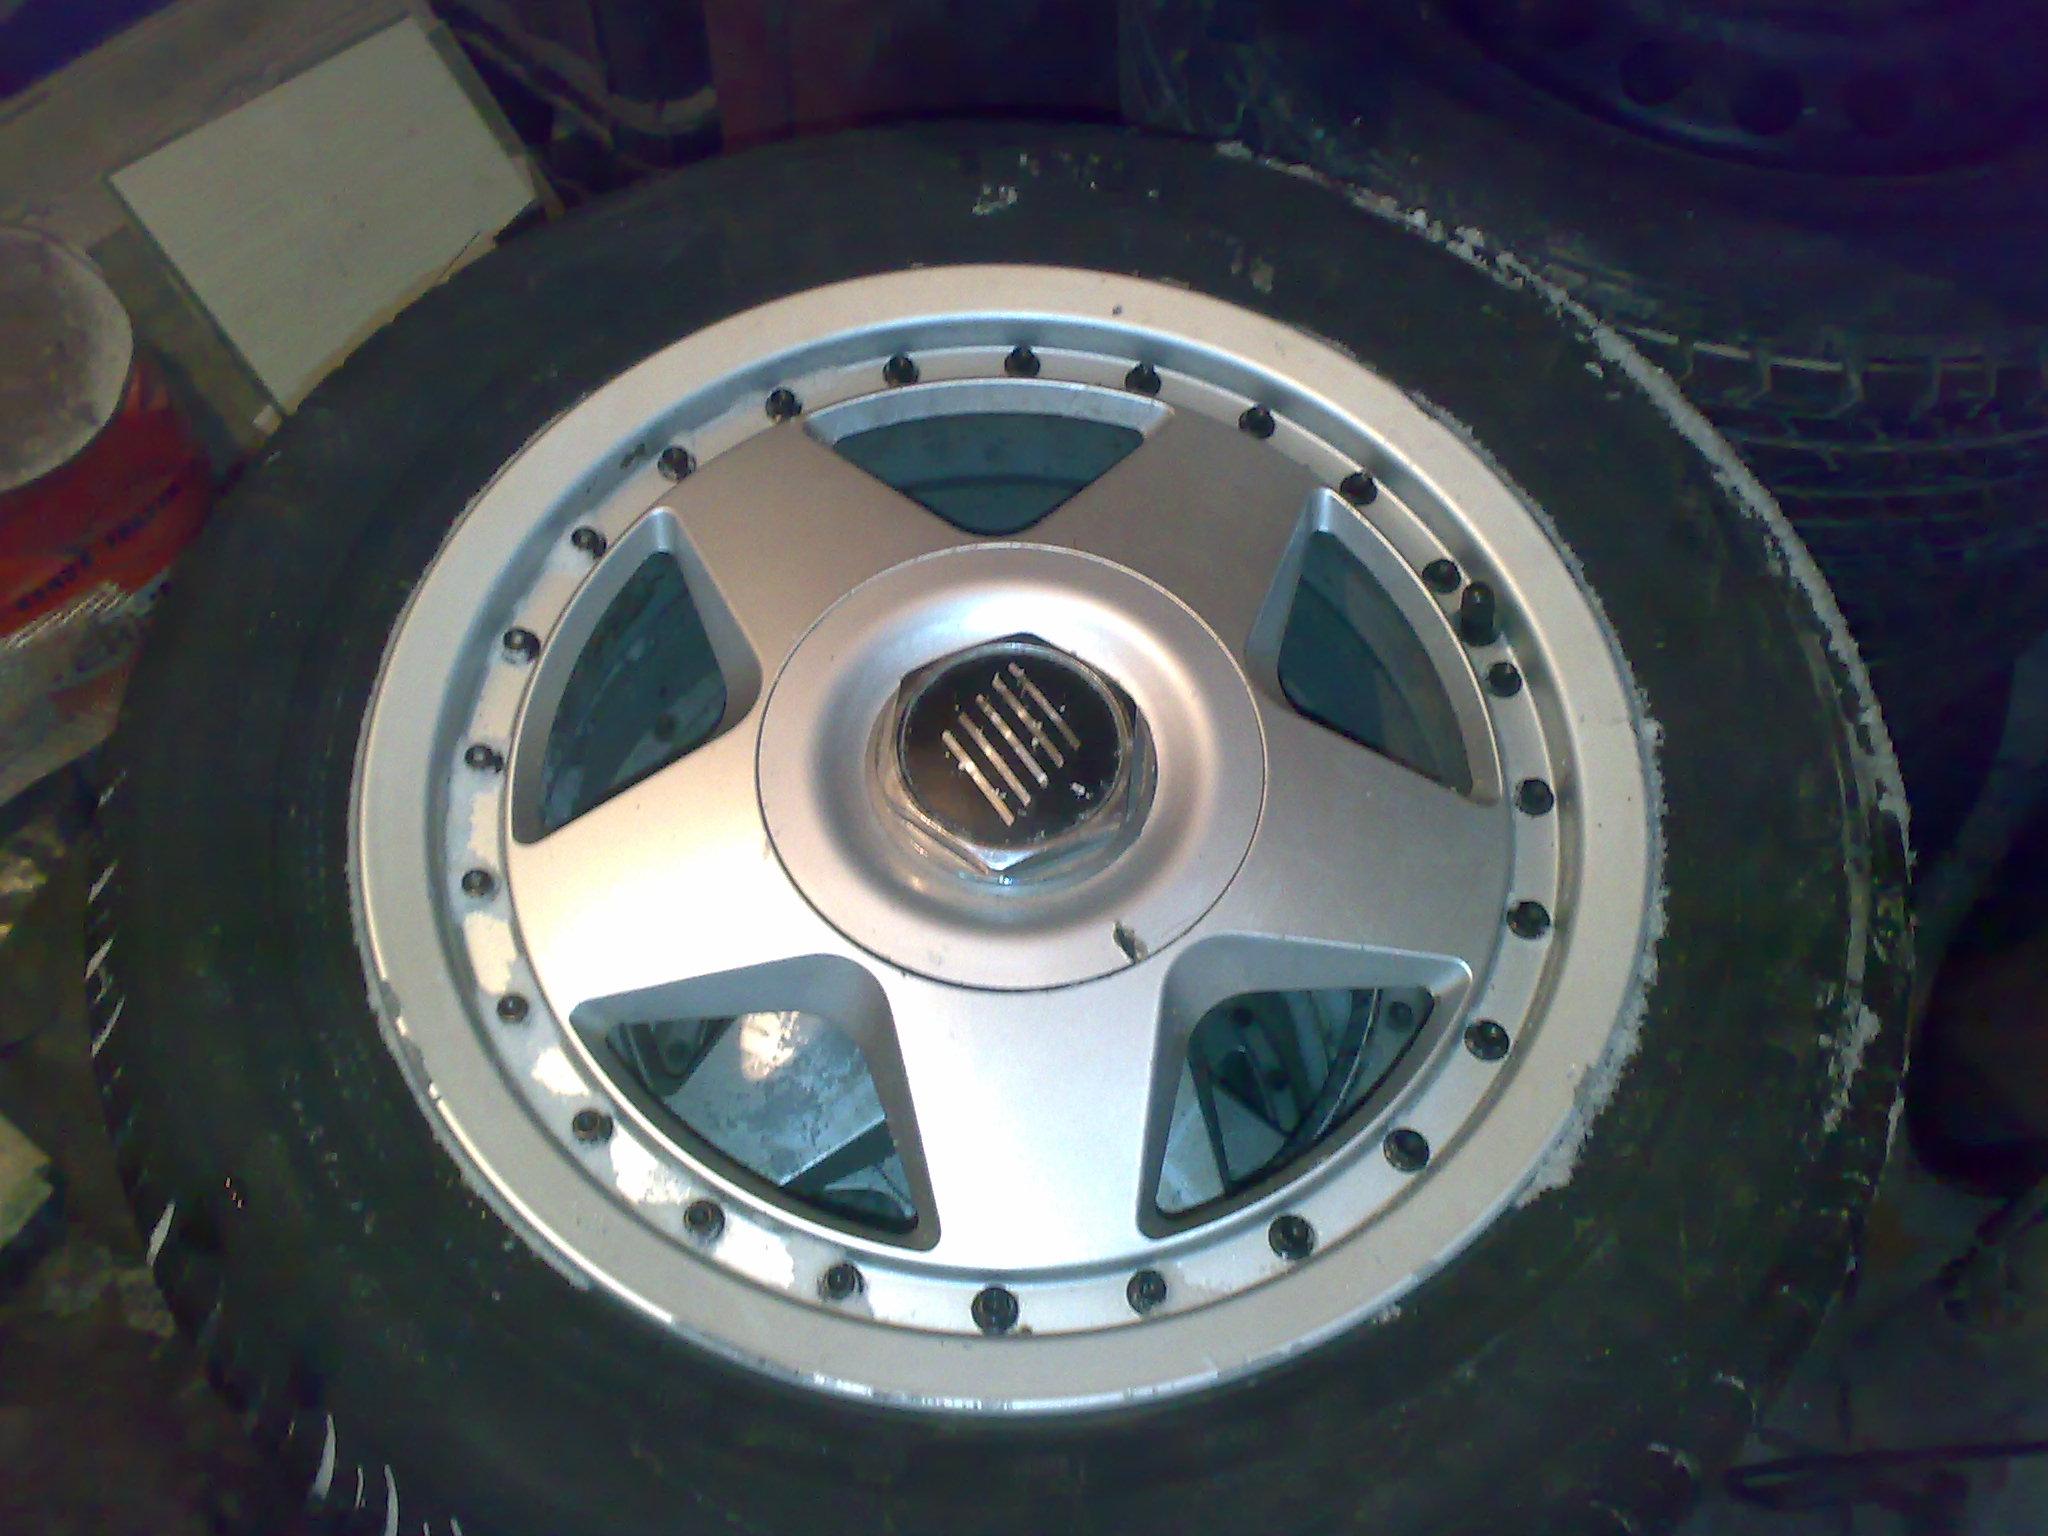 Kupi� felg� aluminiow� lub wymieni� z dop�at� fiat brava.